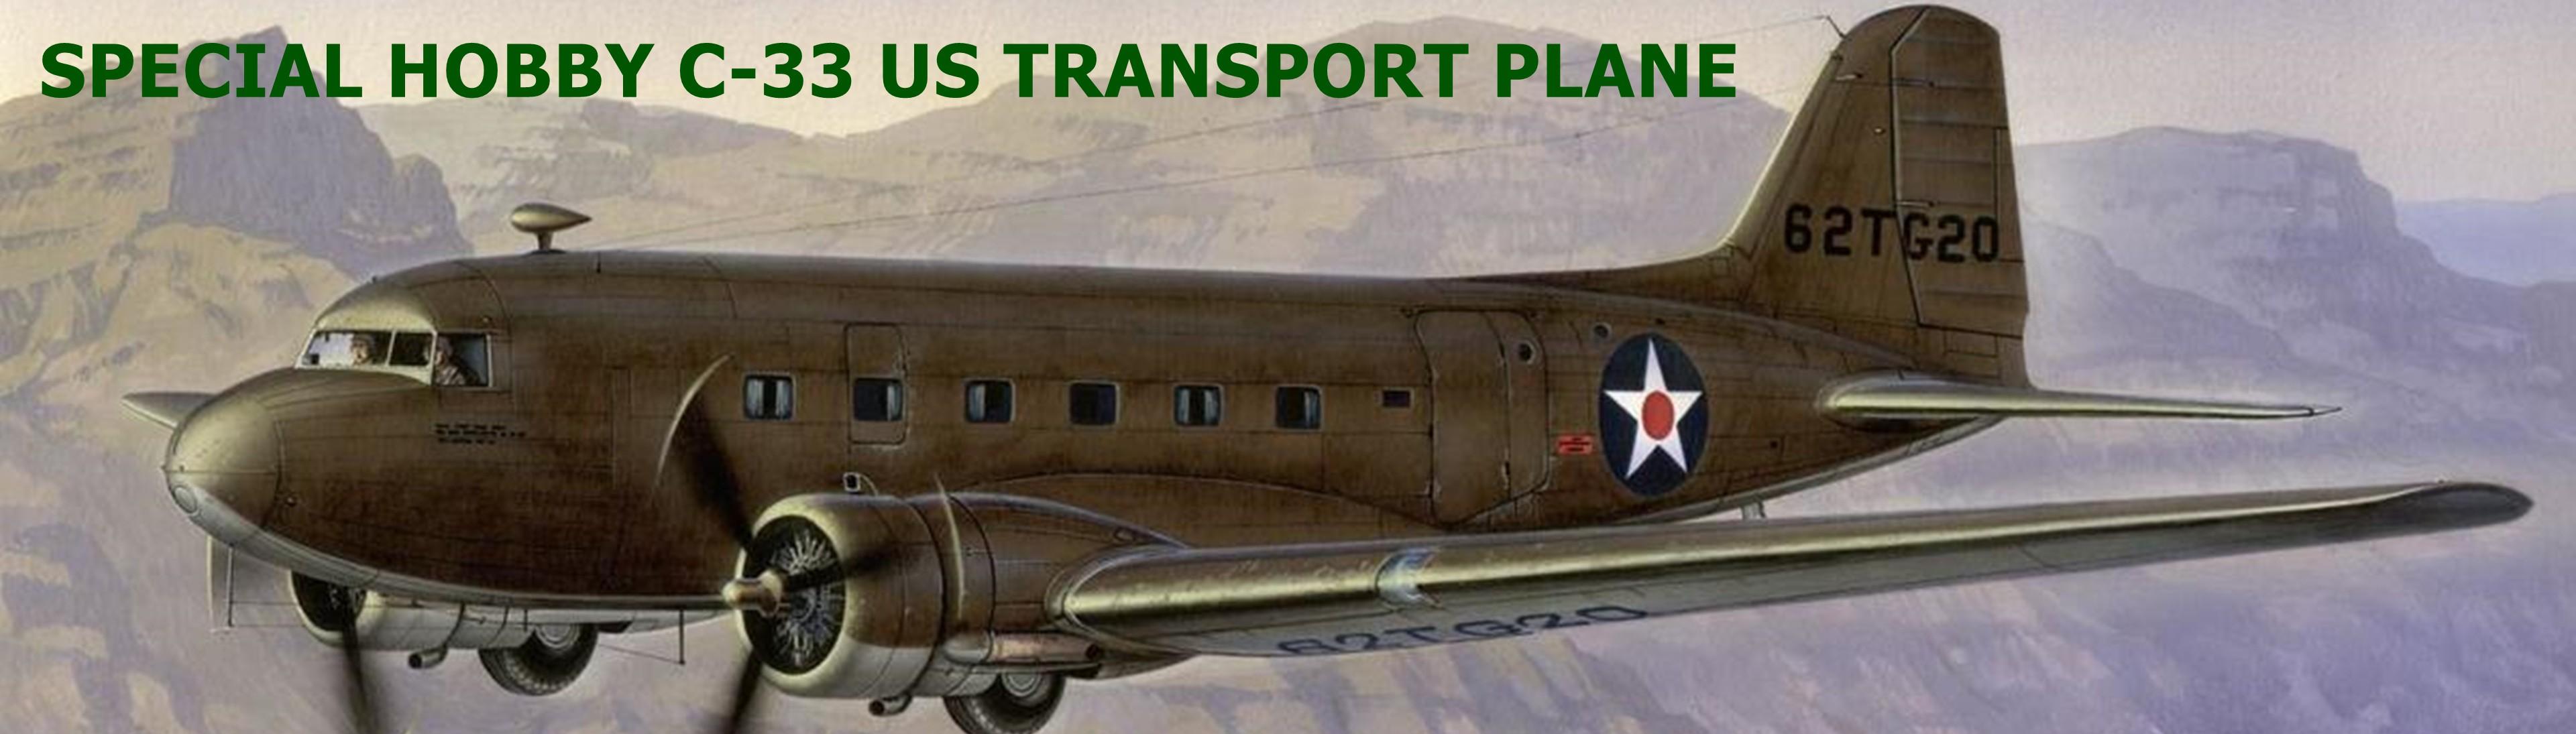 "SPECIAL HOBBY C-33/C39 ""US TRANSPORT PLANE"" 1:72"